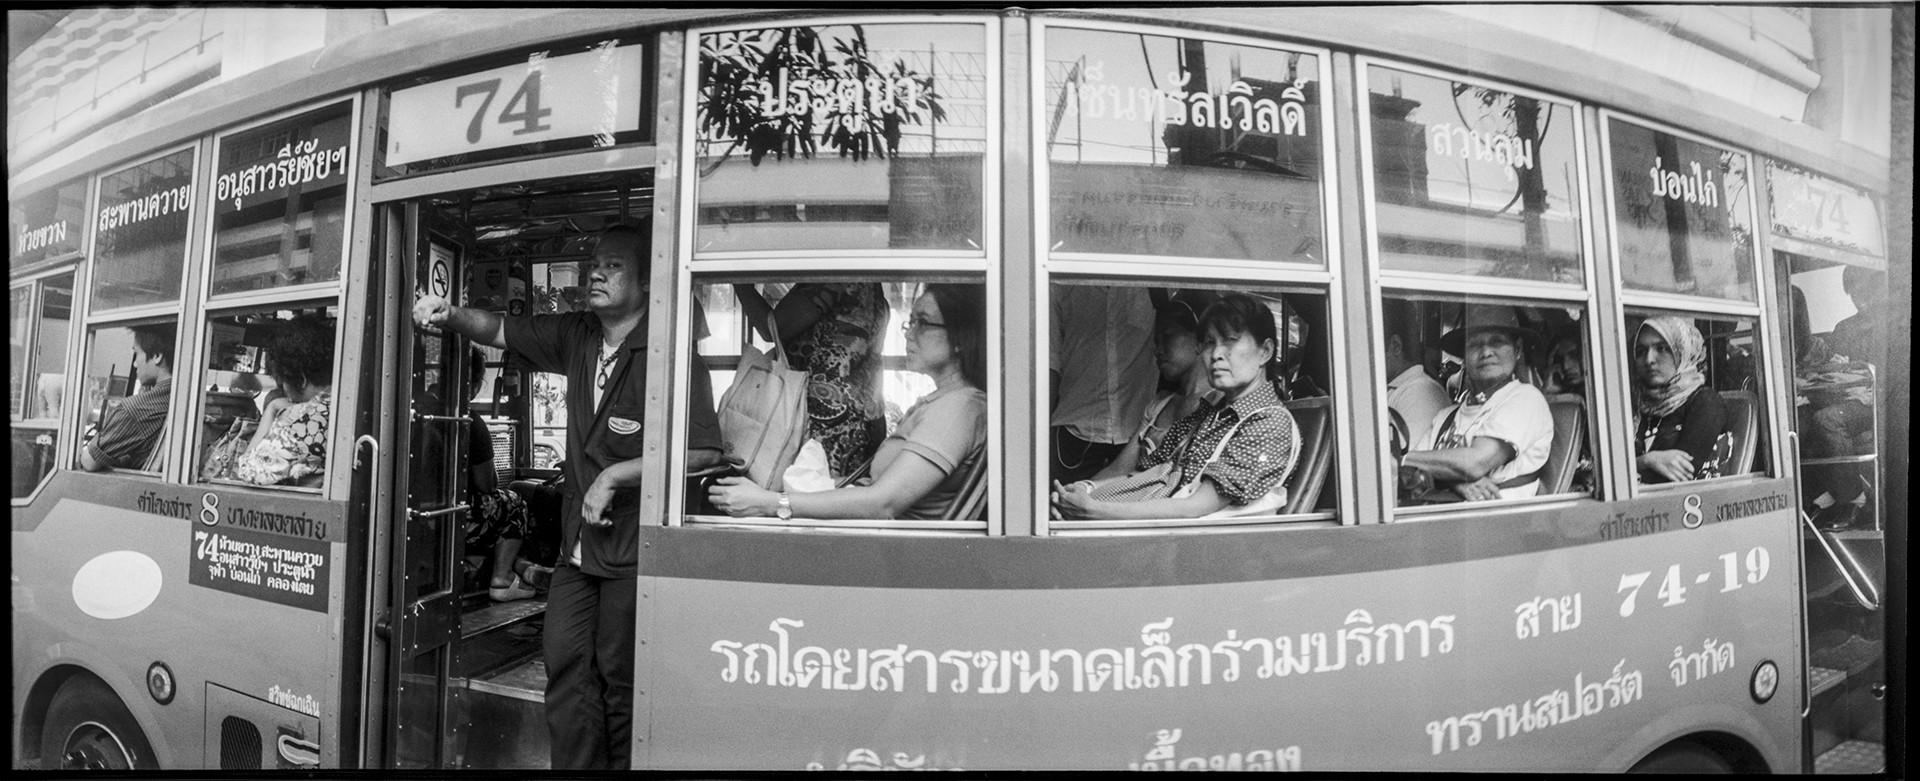 Bangkok. Thailand